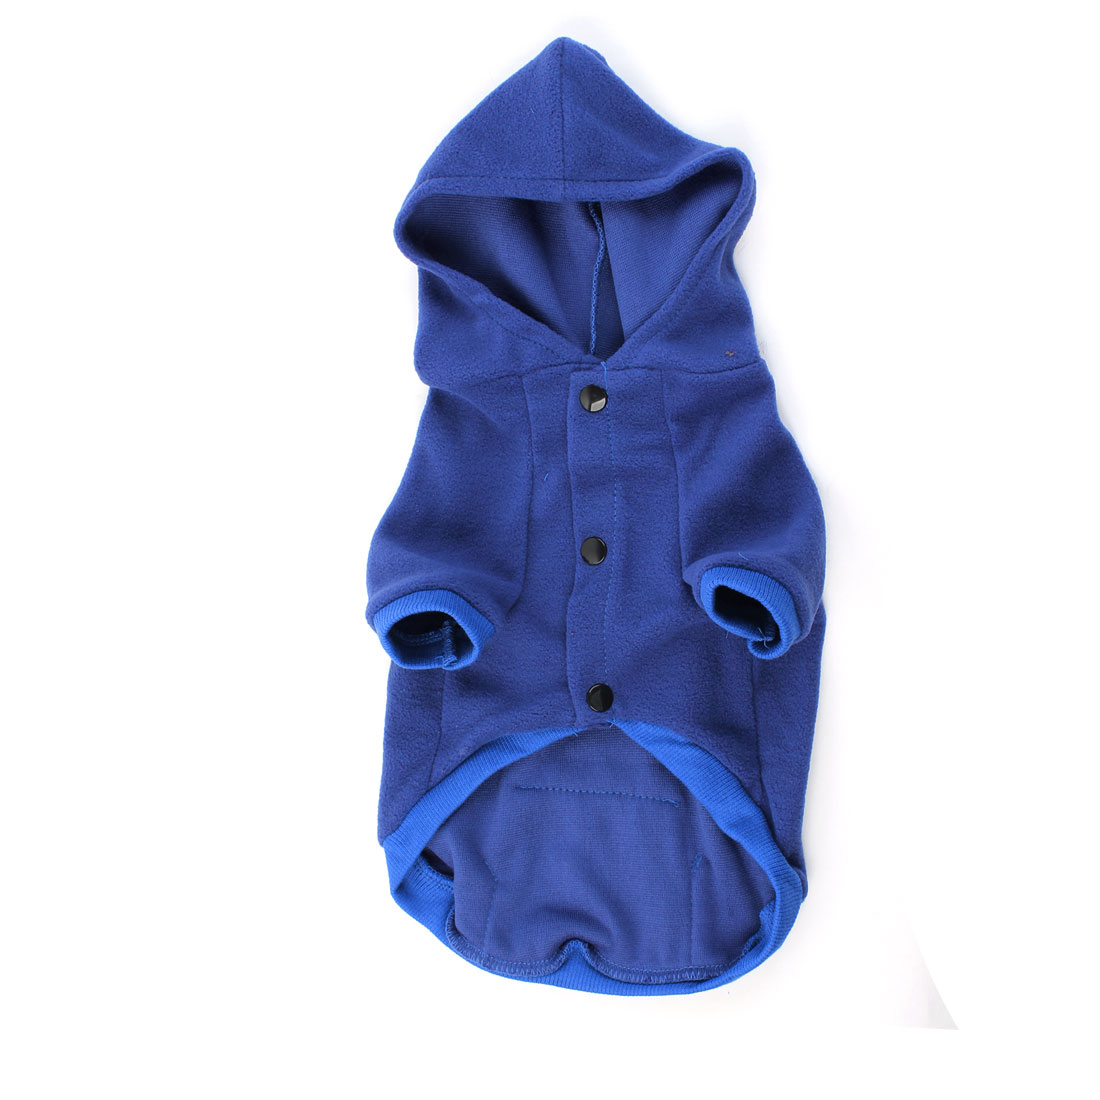 Press Stud Button Hooded Pet Dog Yorkie Pocket Coat Clothes Blue M